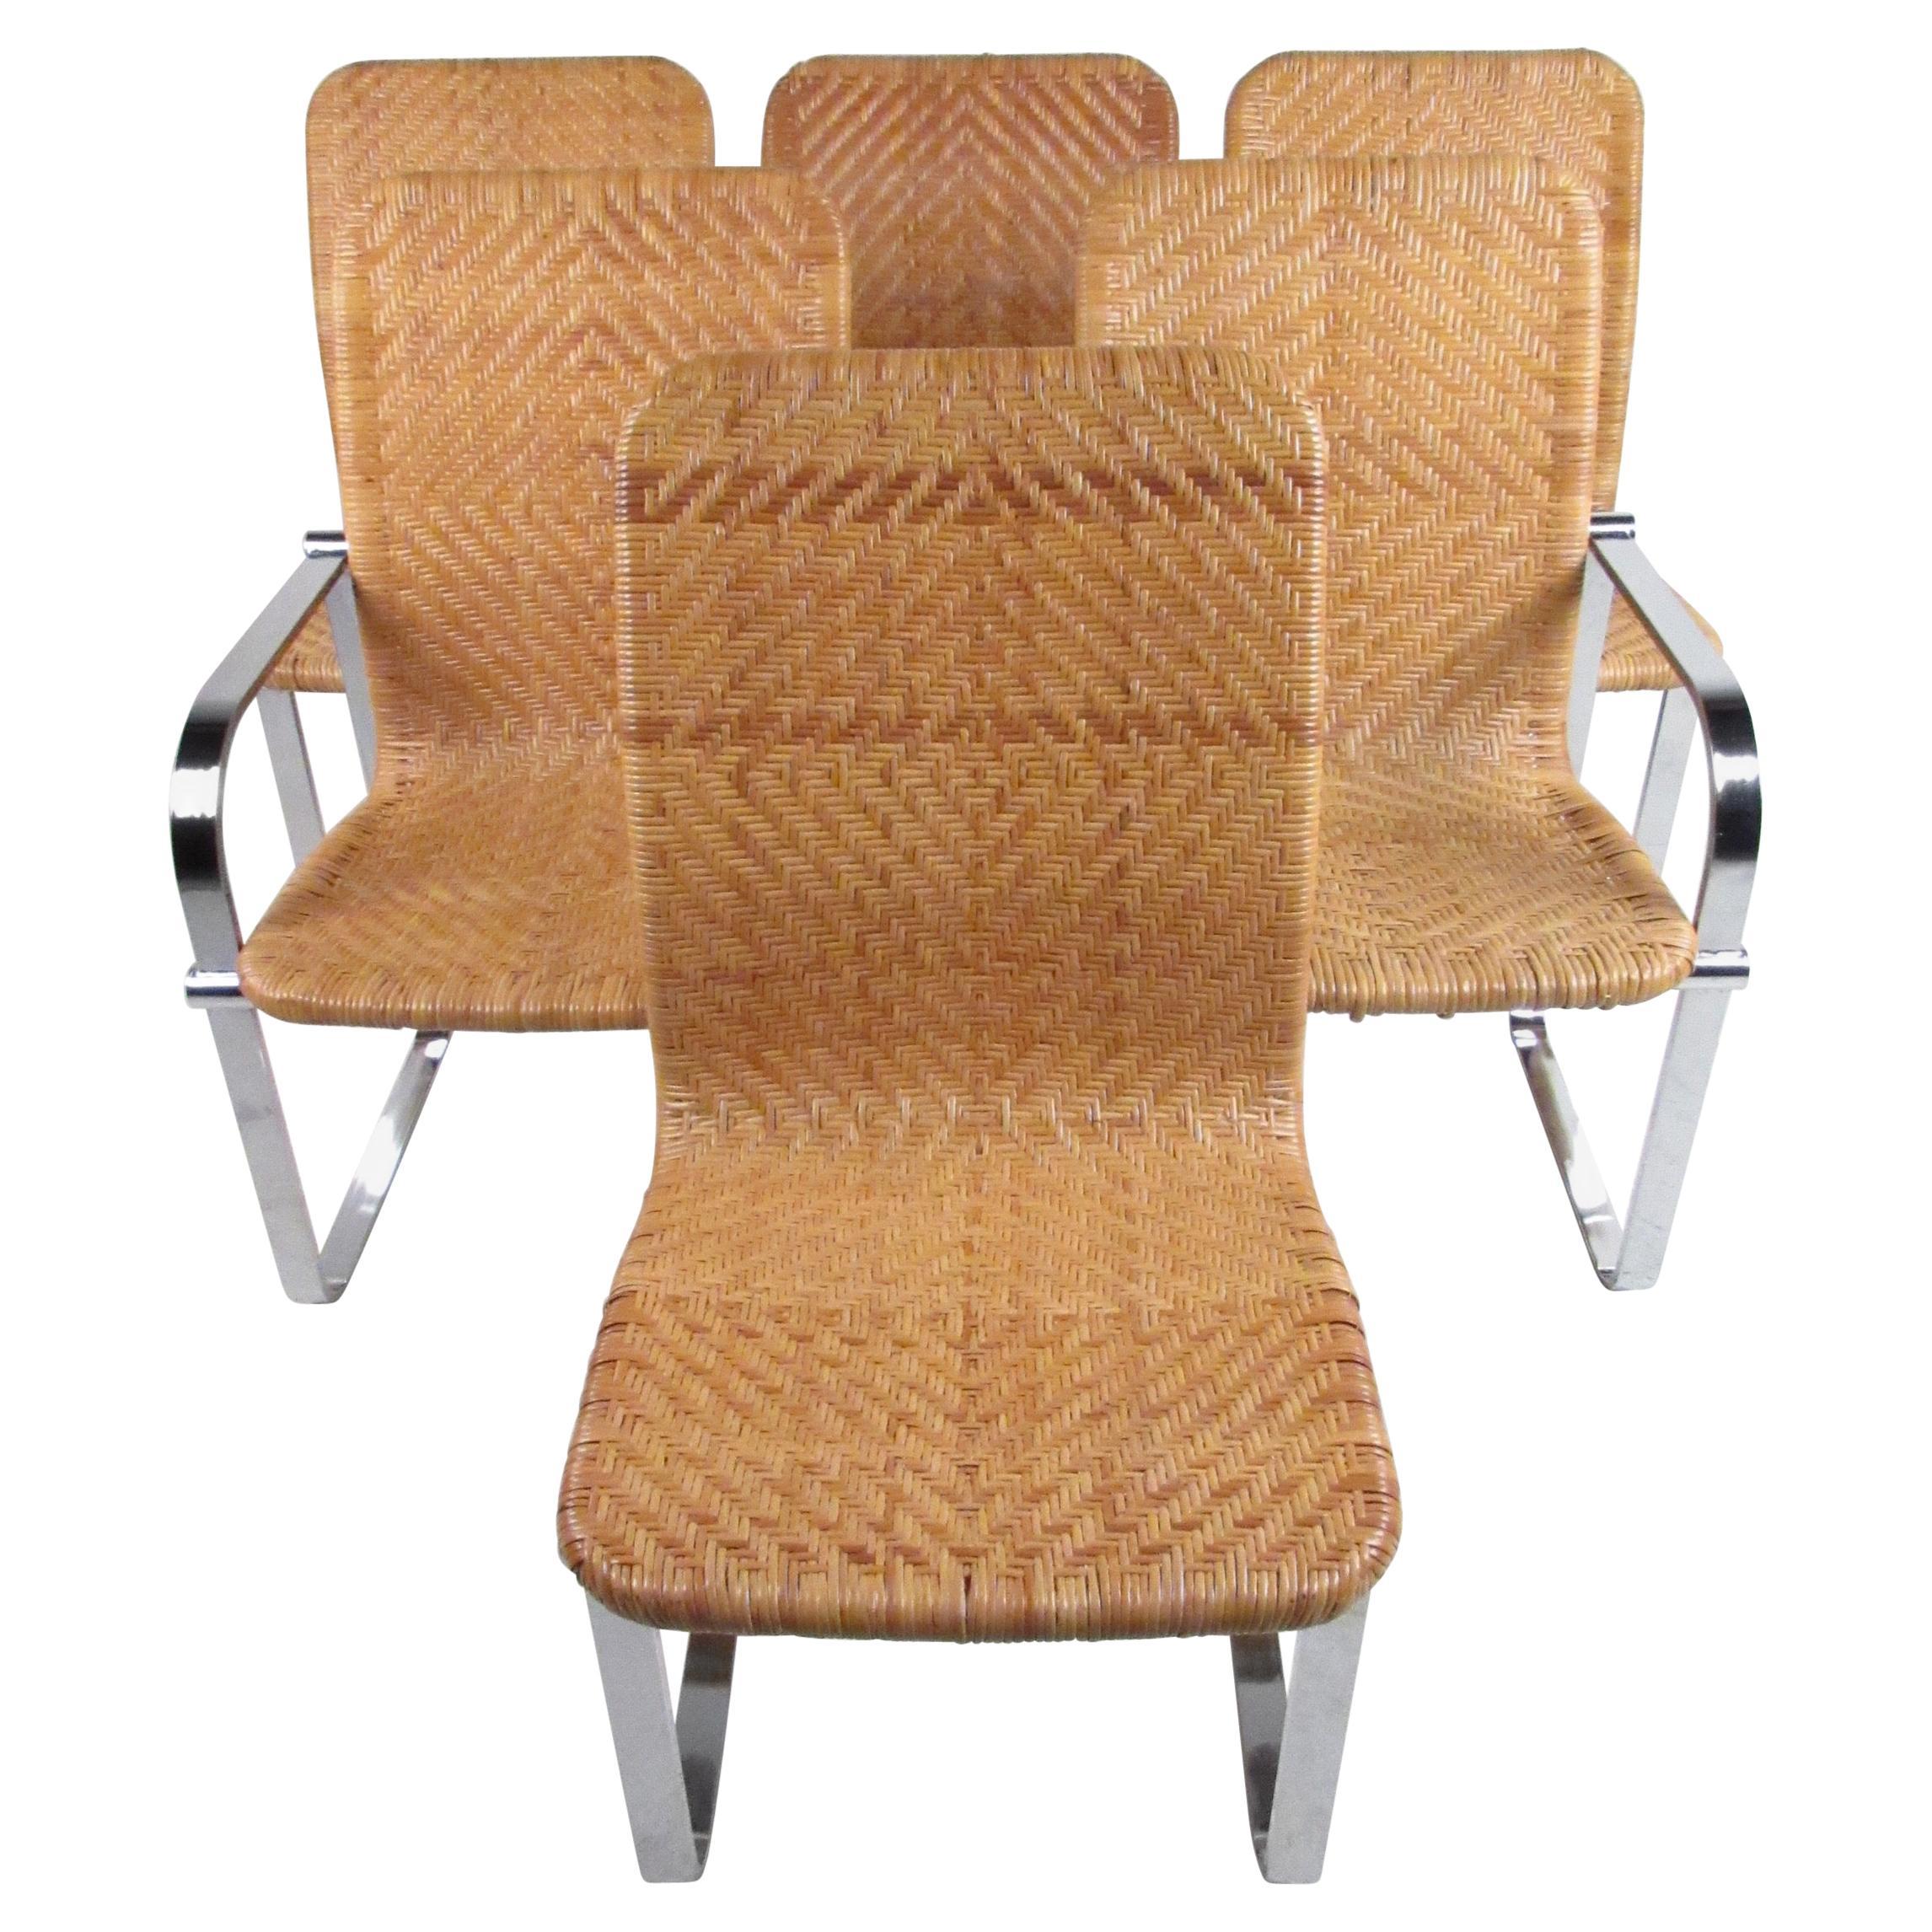 Six Rattan & Chrome Dining Chairs